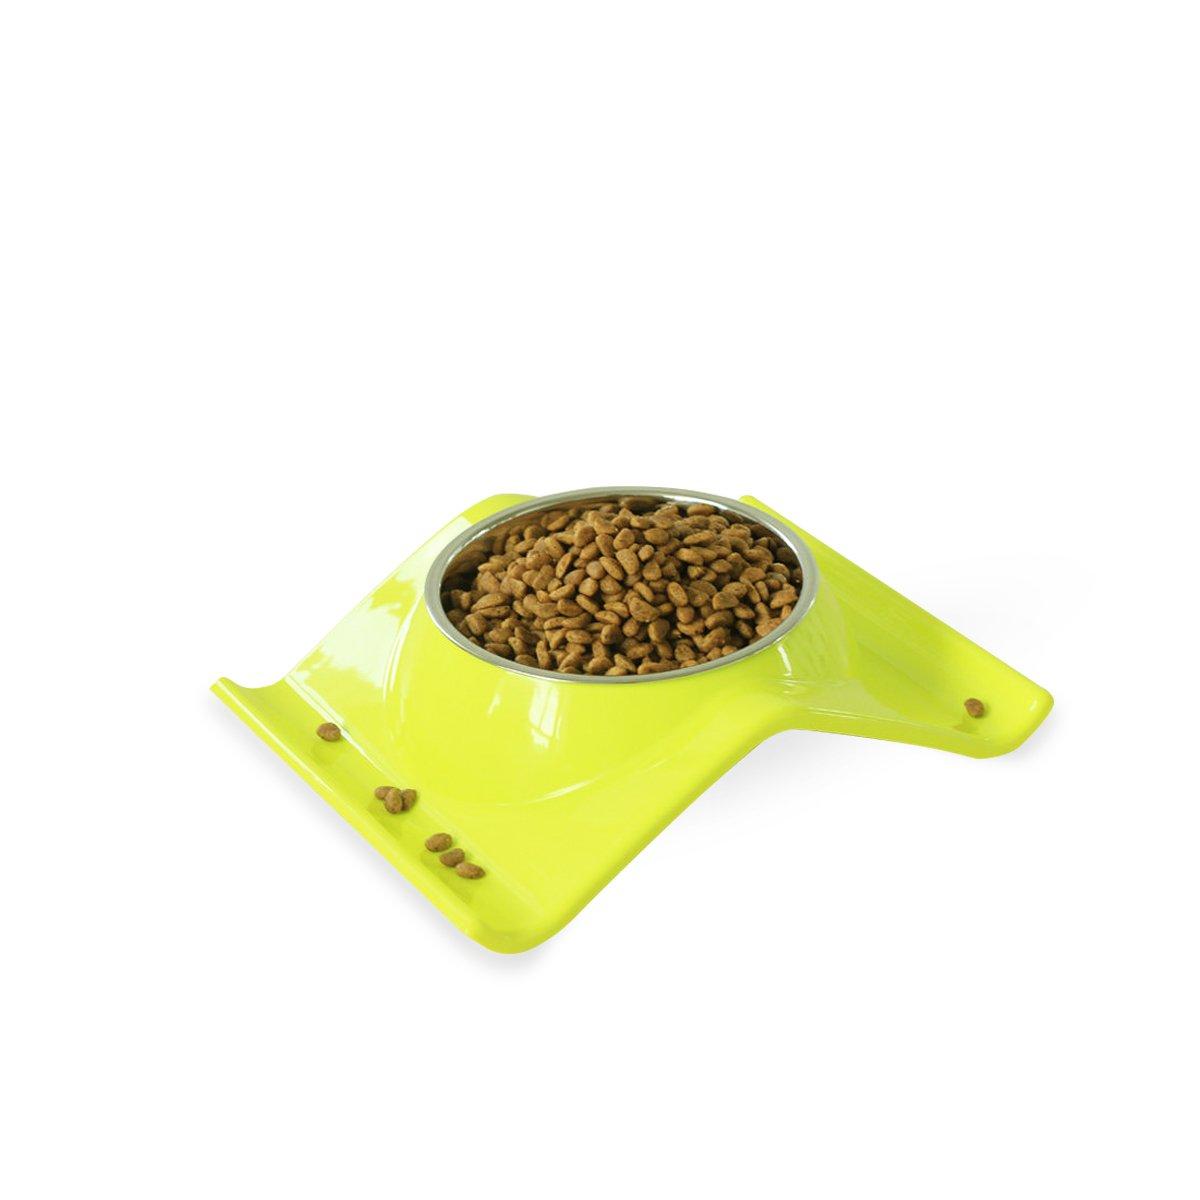 PETCUTE Lindo Perro Doble Gato Cuencos de Acero Inoxidable Mascotas Cuencos No-derrame no Derrame Alimentos Para Mascotas Alimentador de Agua Amarillo